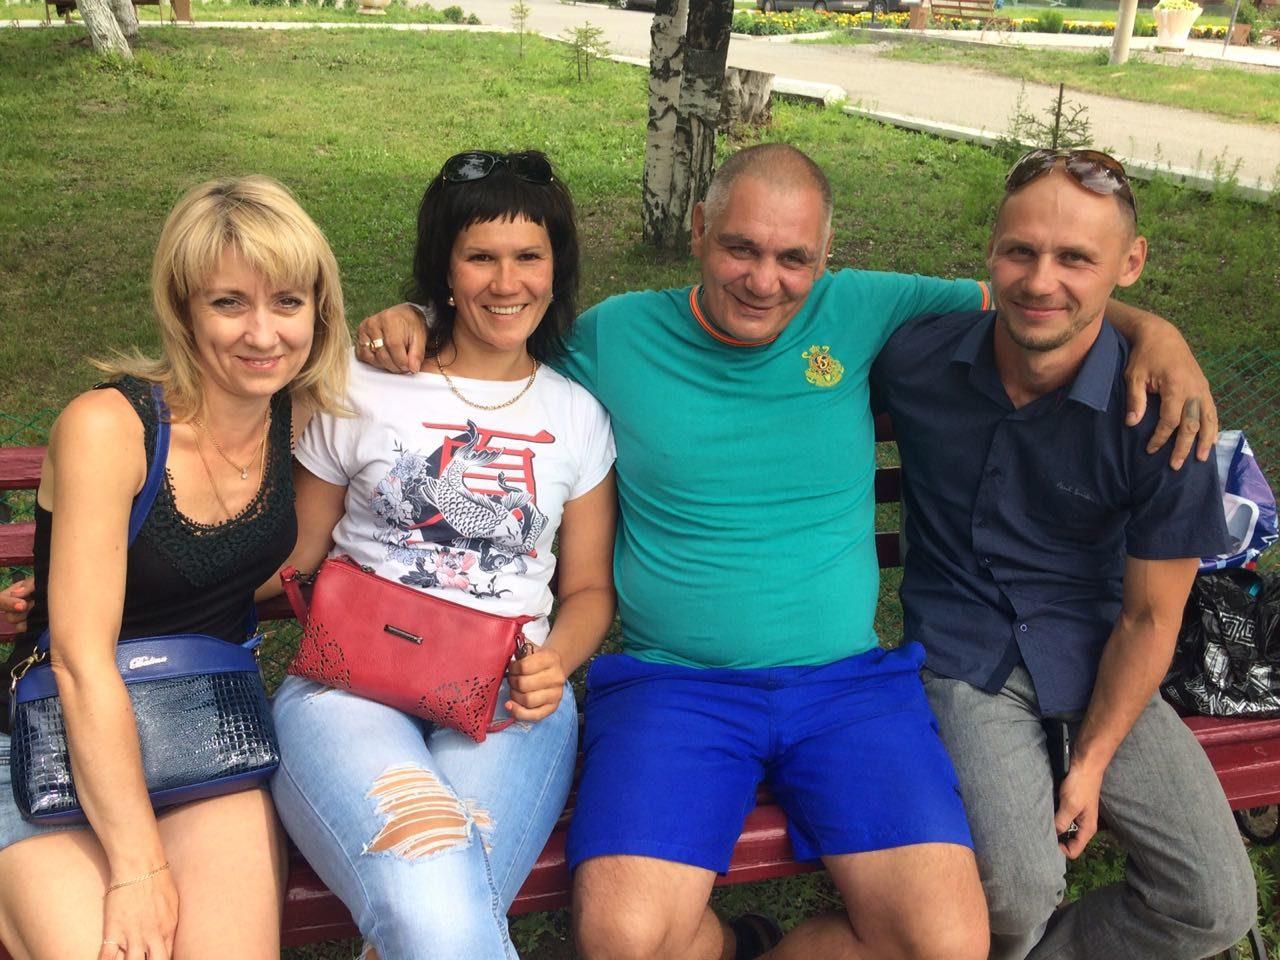 Вахрушев Андрей: Я тоже из Игарки